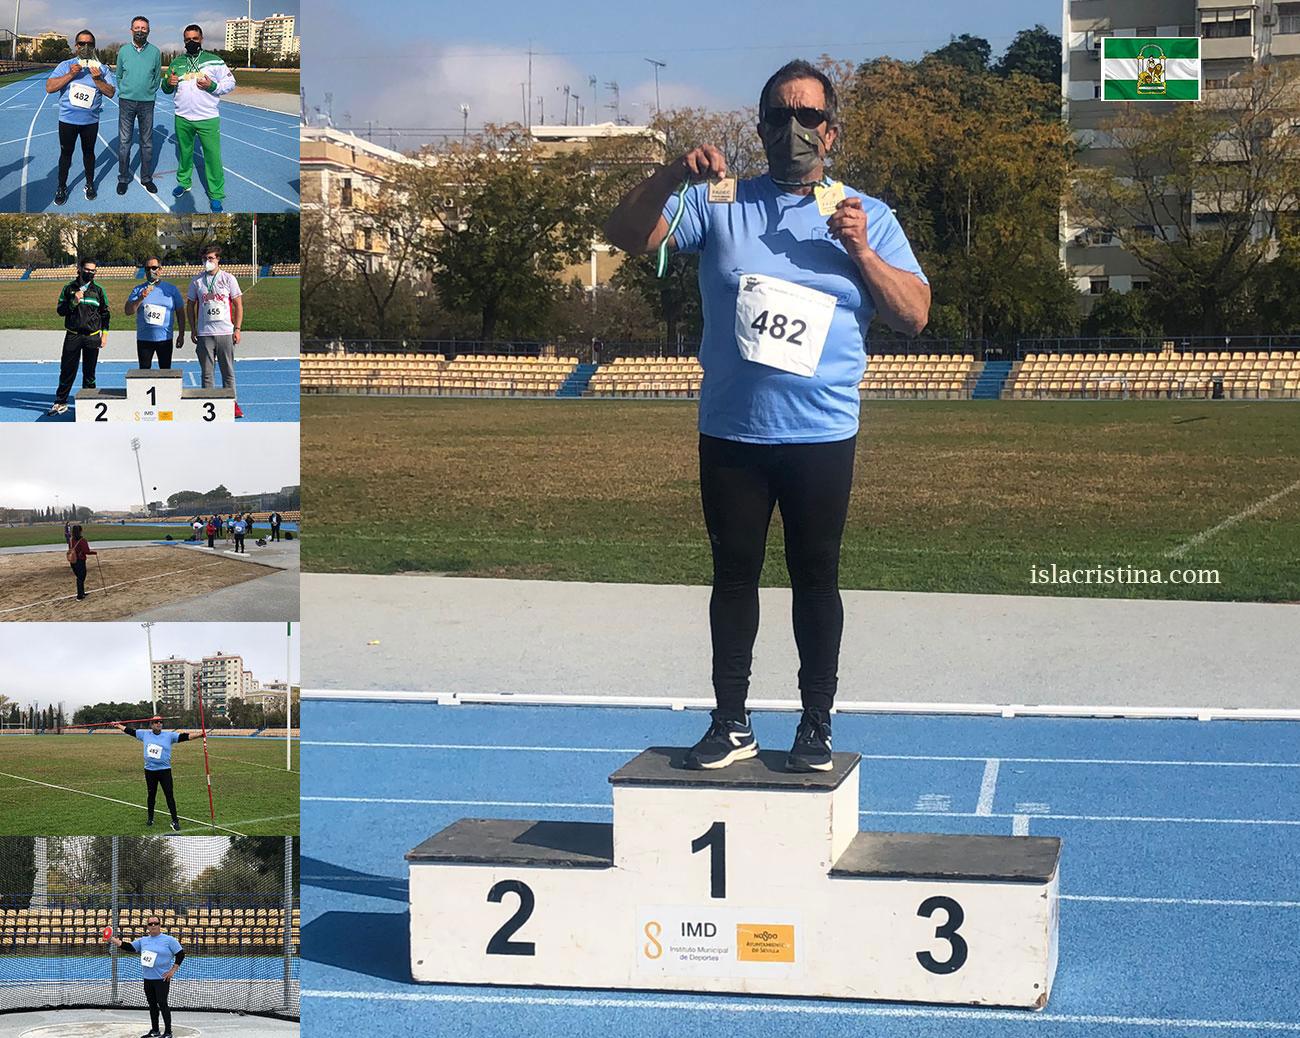 Toni Palma triunfador del Campeonato de Andalucía FADEC